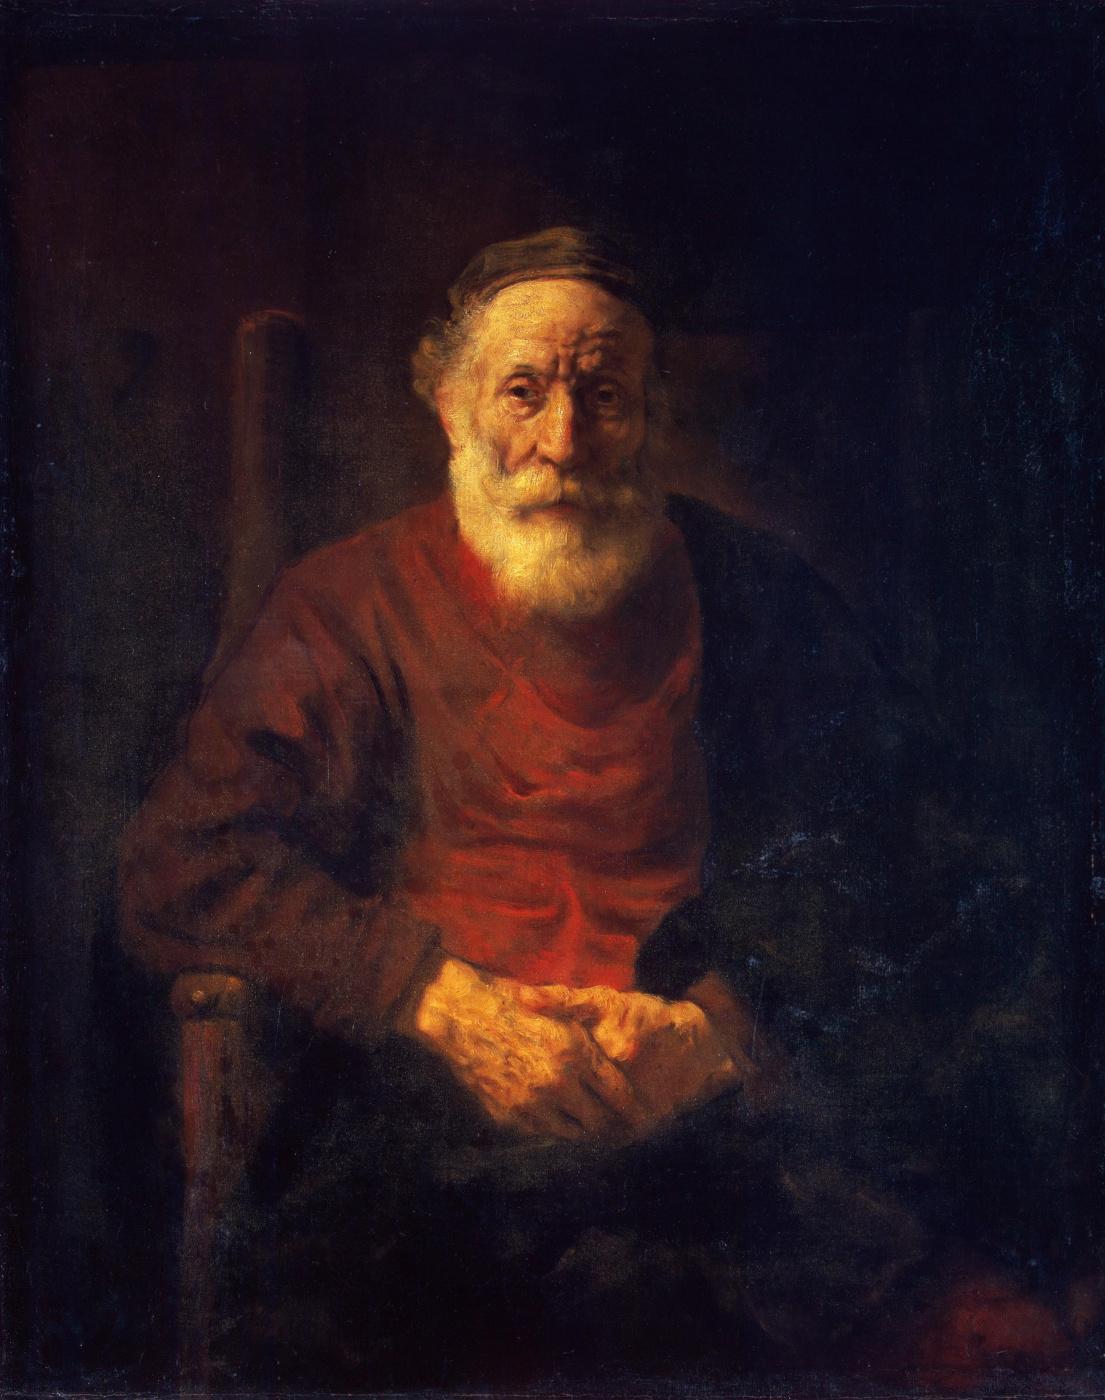 Rembrandt Harmenszoon van Rijn. Portrait of an old man in red